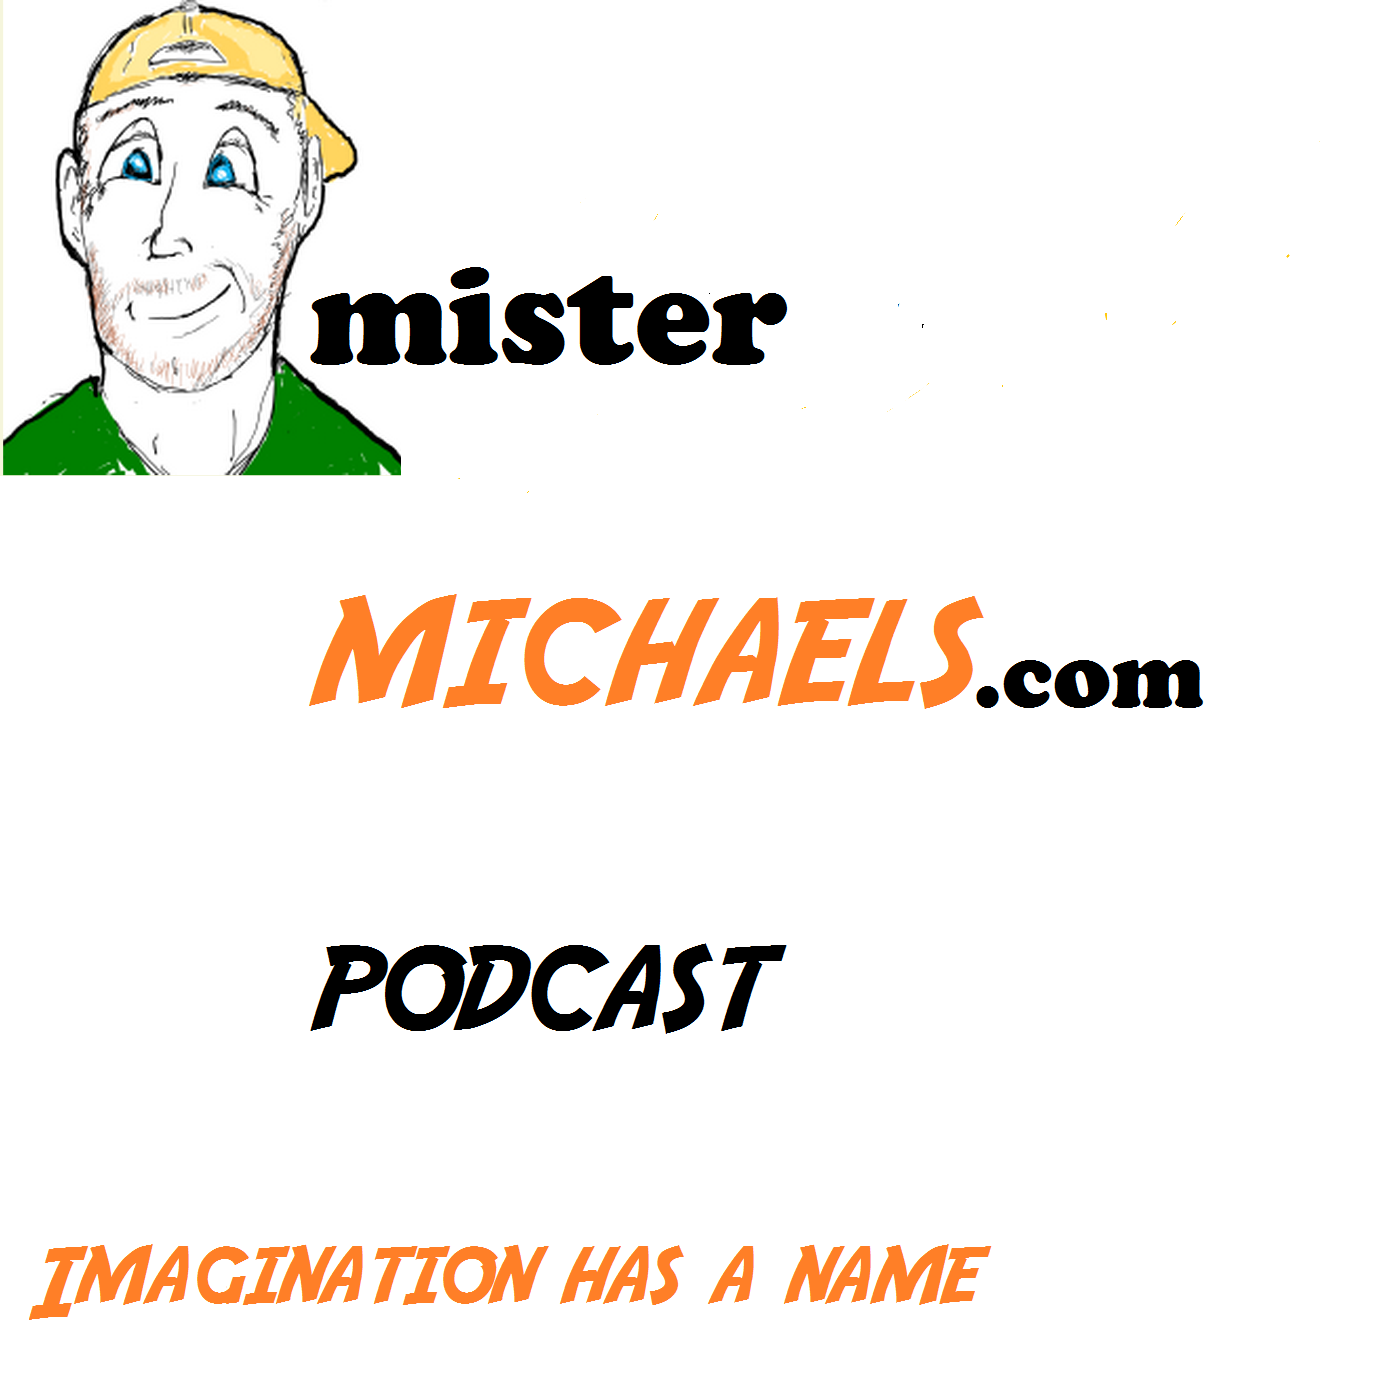 mistermichaels's podcast